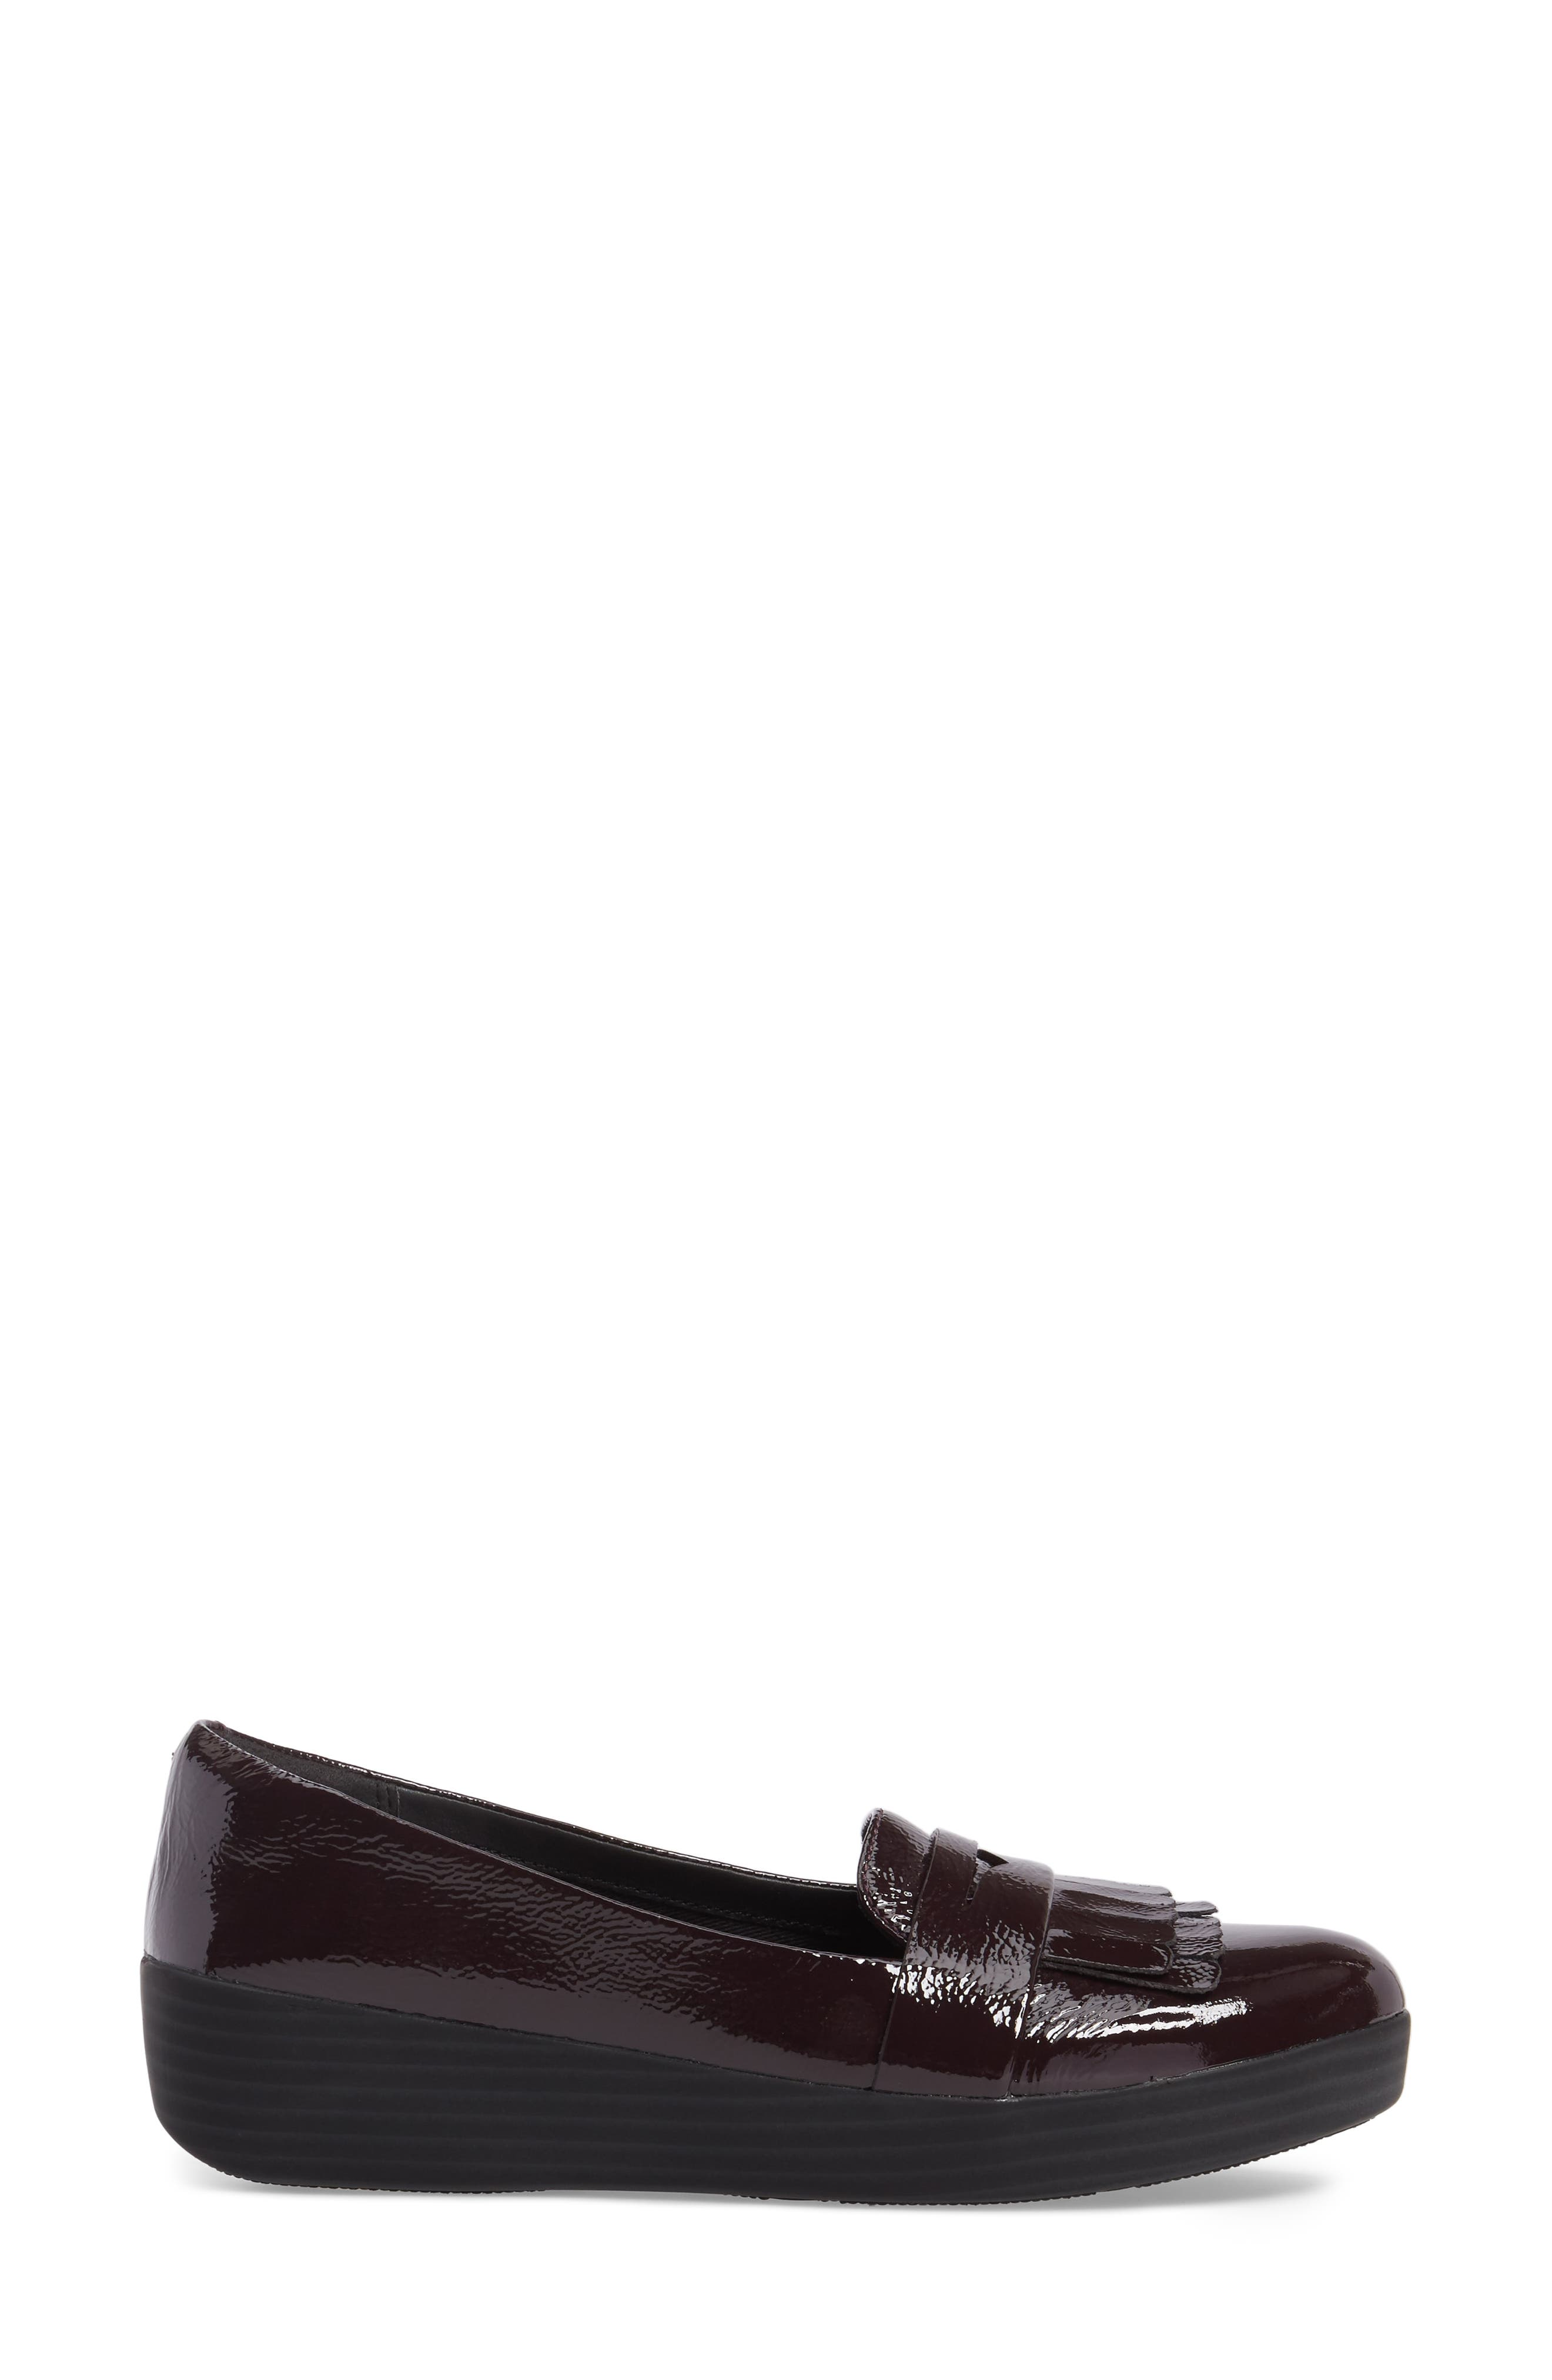 Alternate Image 3  - FitFlop™ Fringey Sneakerloafer Slip-On (Women)